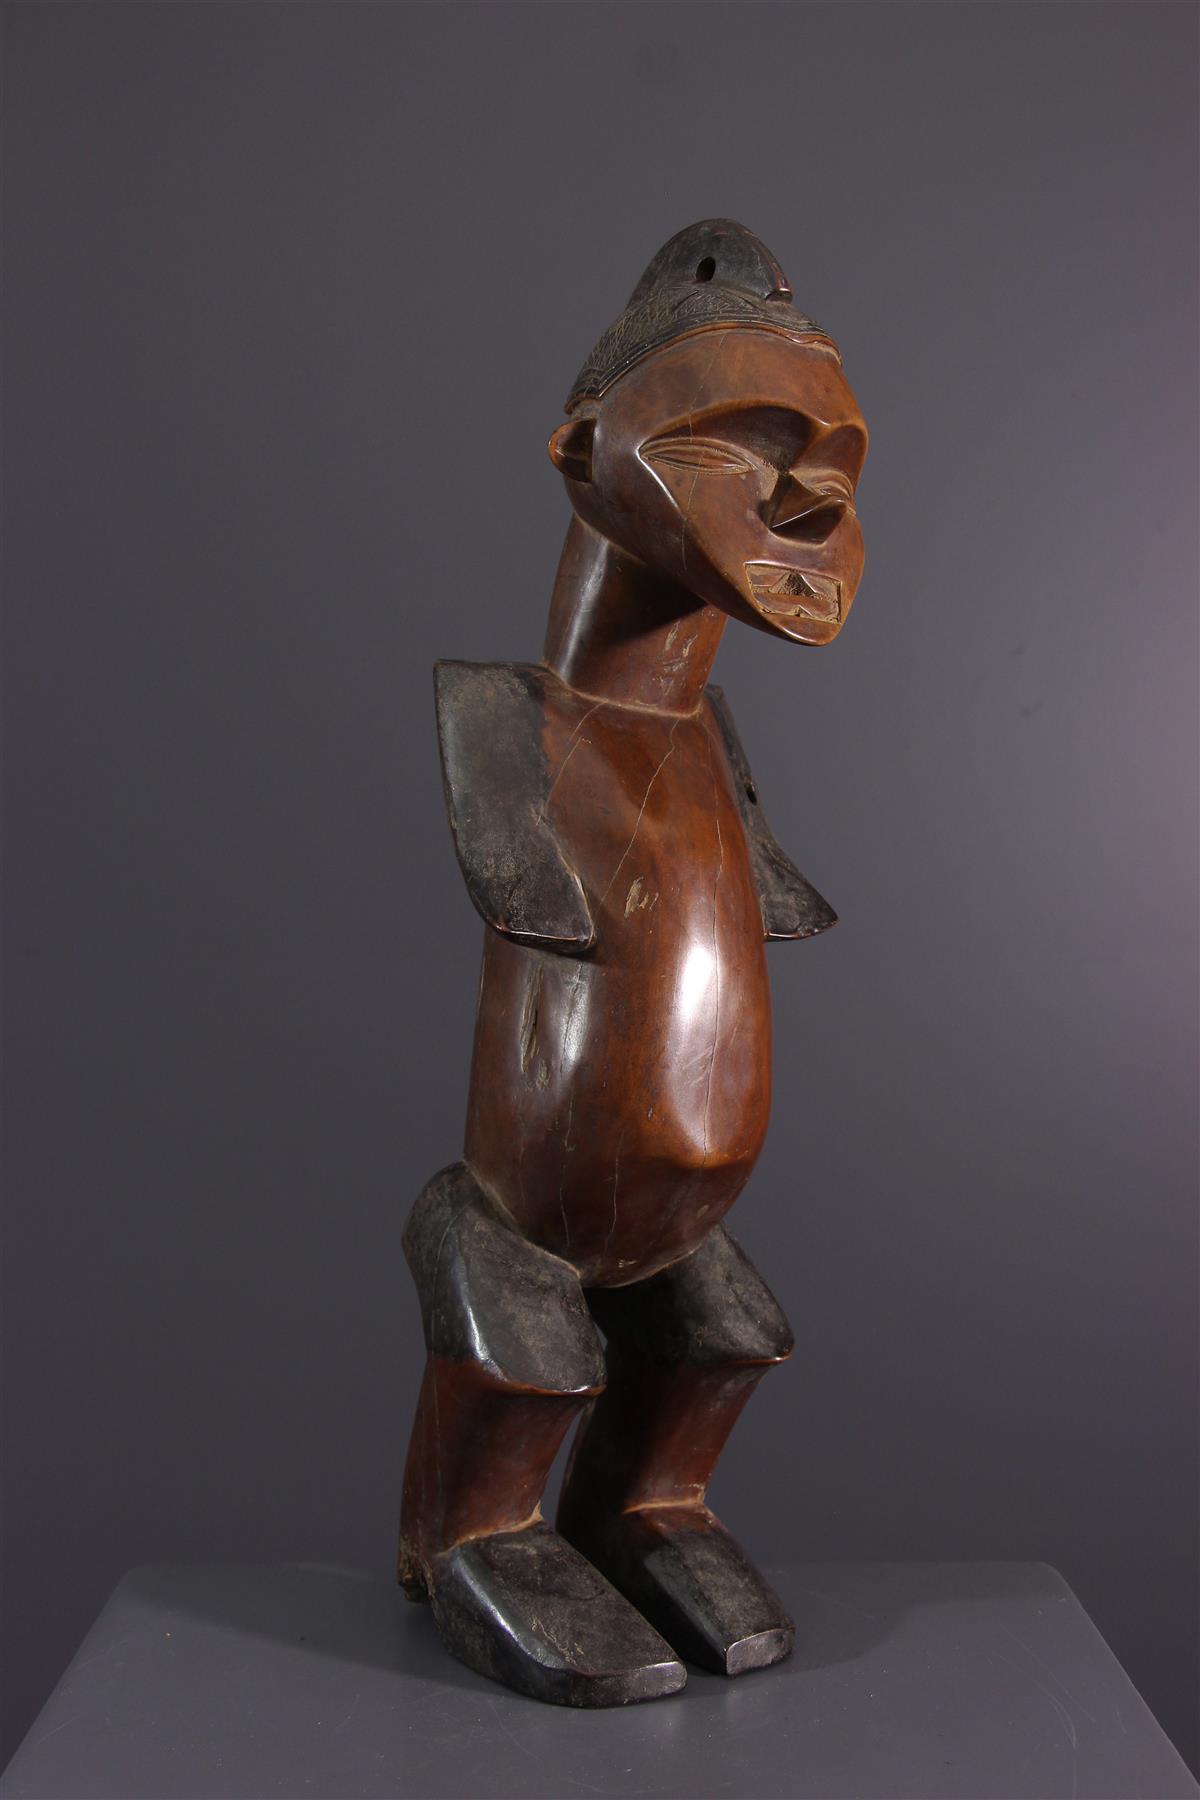 Suku standbeeld - Afrikaanse kunst